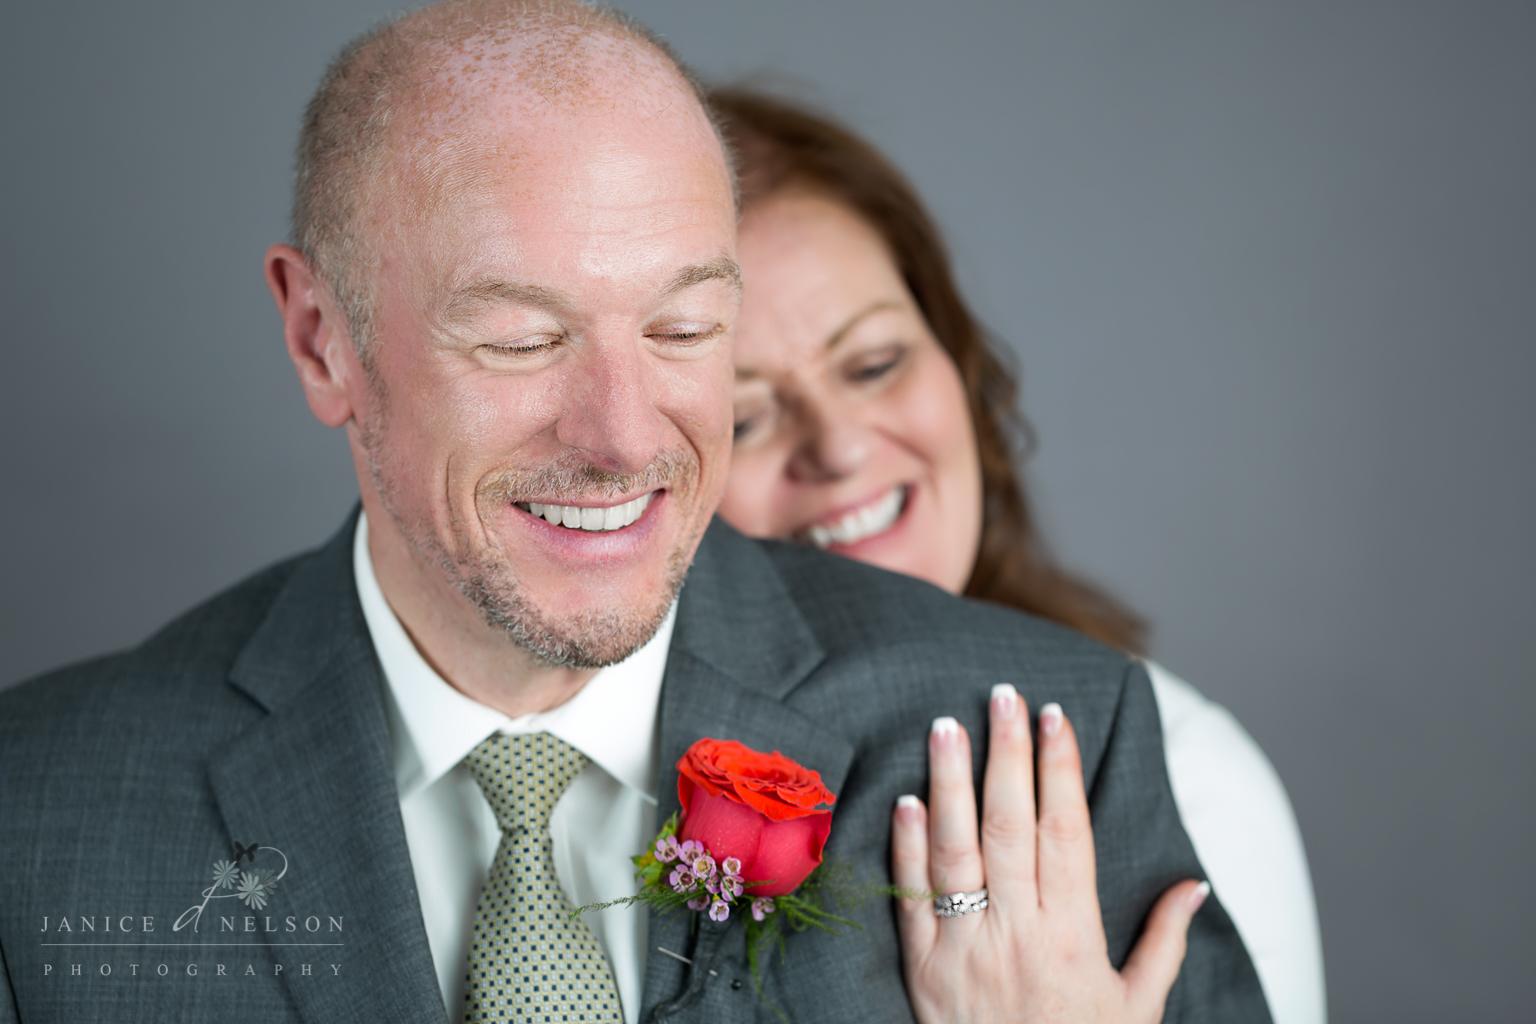 In-studio Bridal Wedding Day Portraits